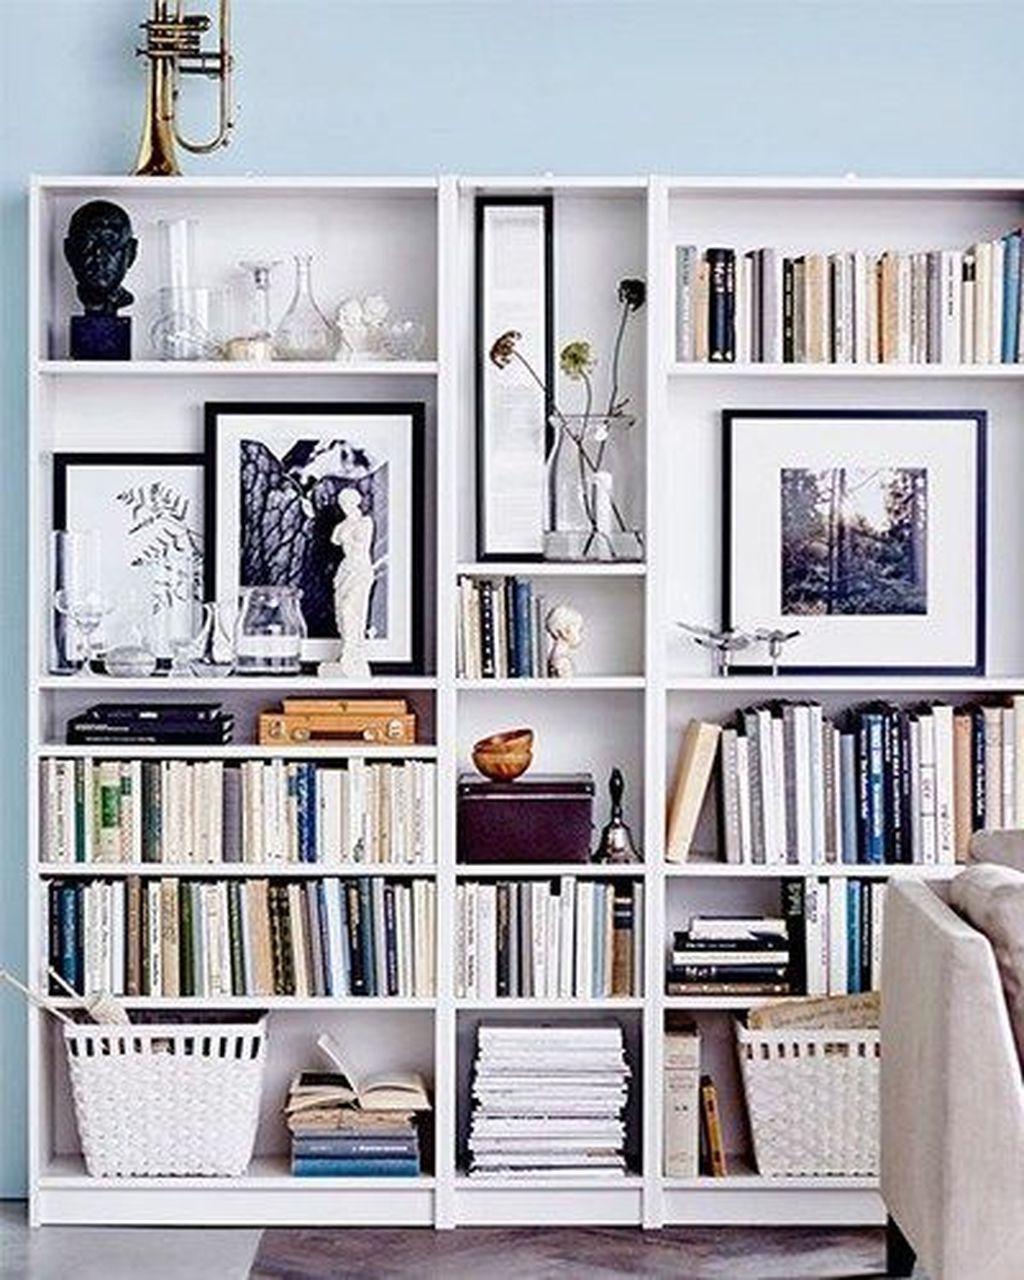 Fabulous Bookshelf Design Ideas For Your Interior Decor 06